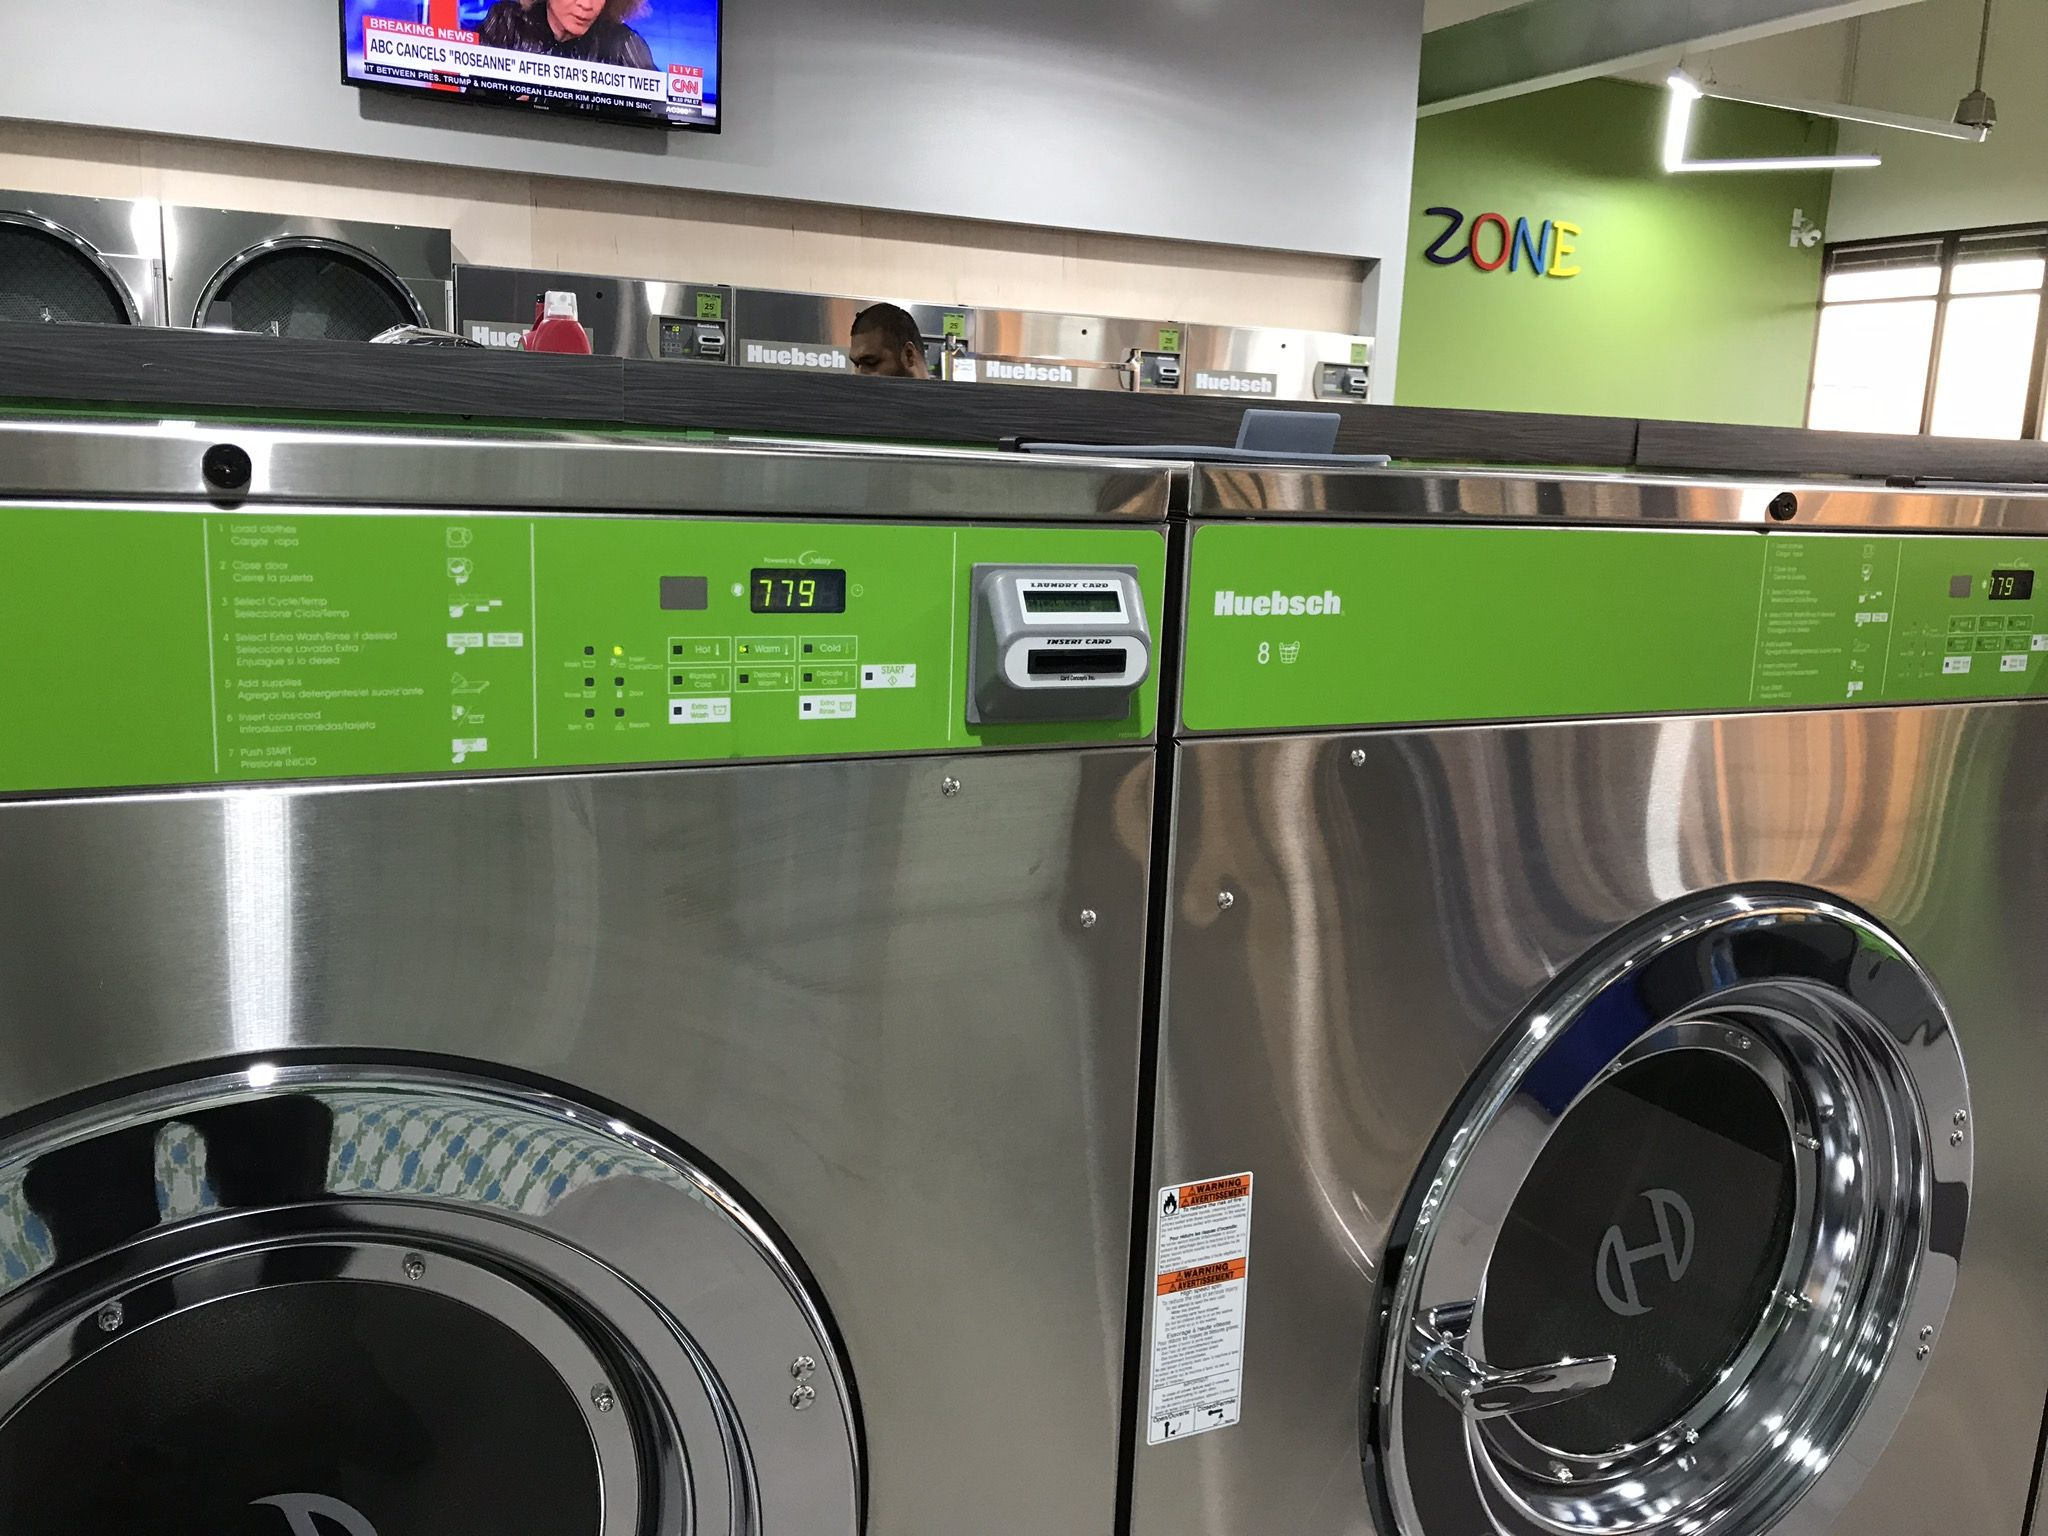 Pin By Schuyler Williamson On Laundromat Washing Machine